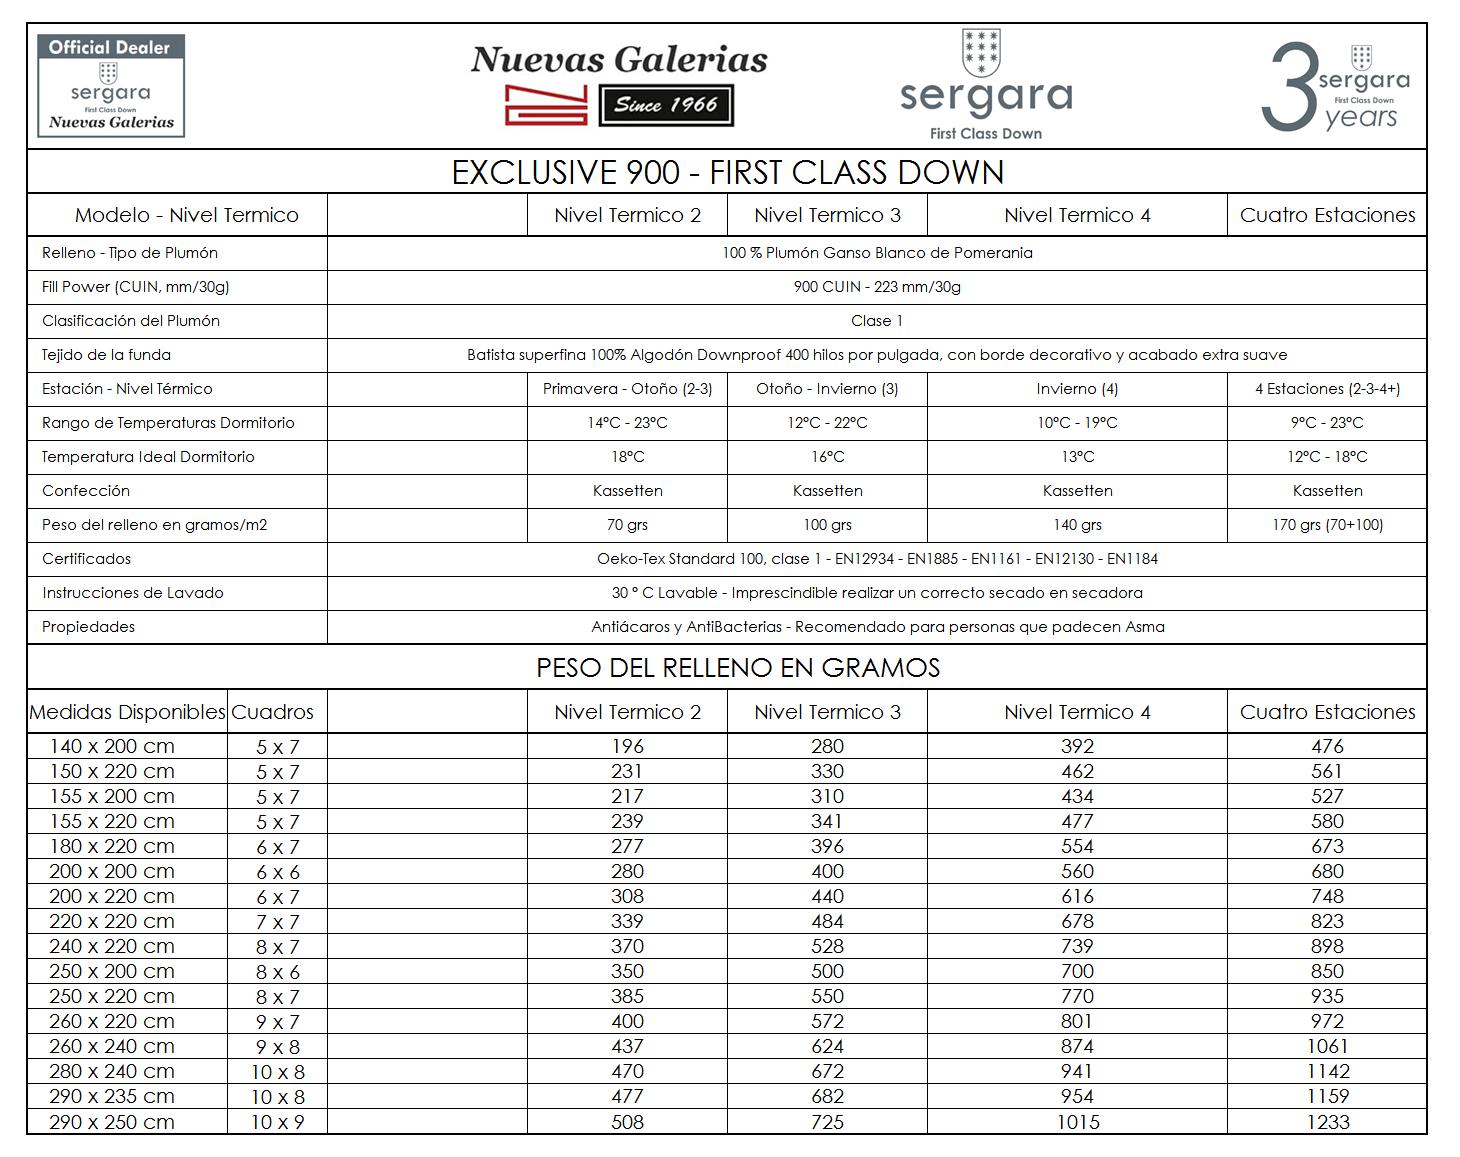 Caracteristicas Nordico Sergara Exclusive 900 First Class Down